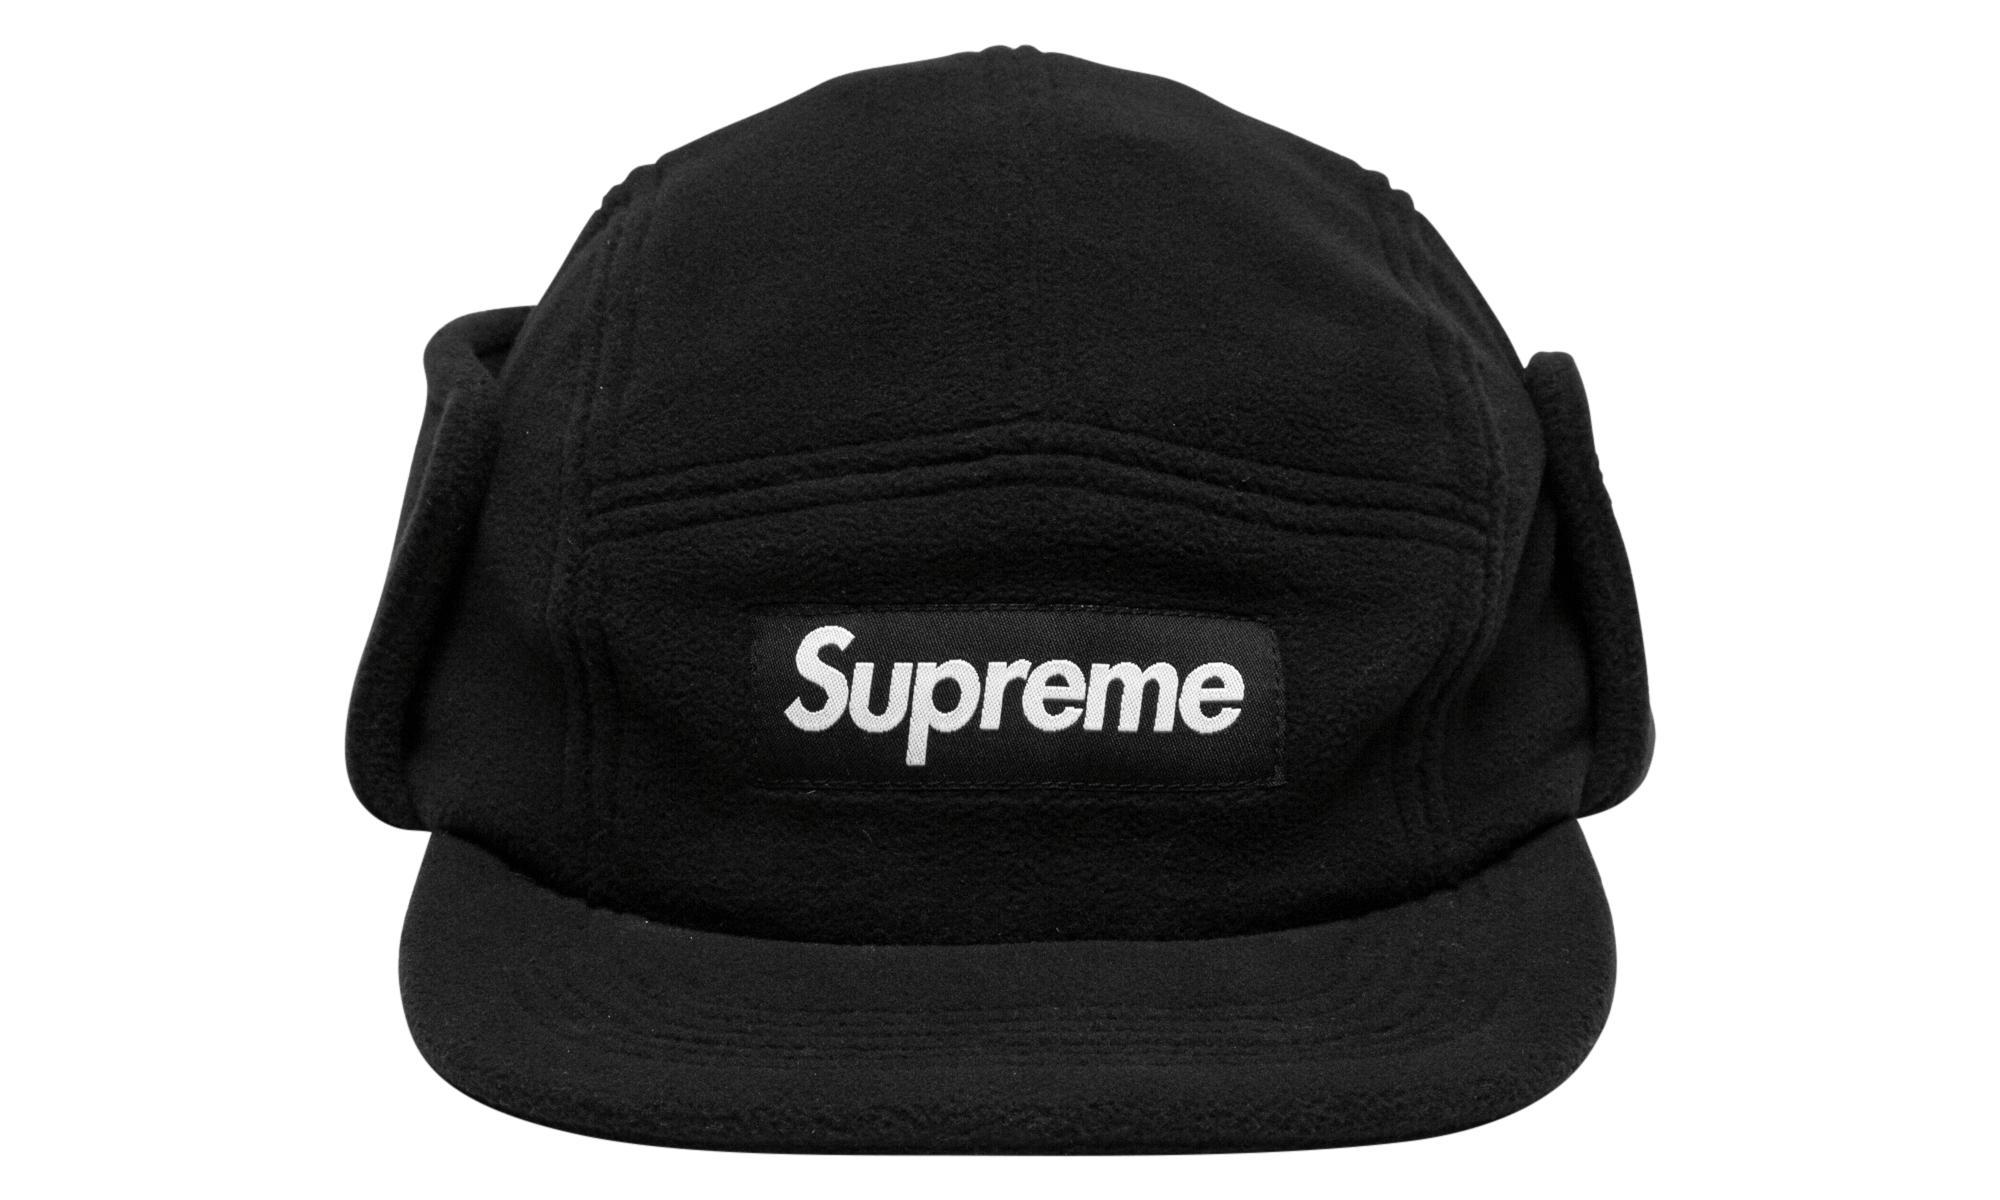 8f192698554 Supreme - Black Polartec Fleece Earflap Camp Cap for Men - Lyst. View  fullscreen